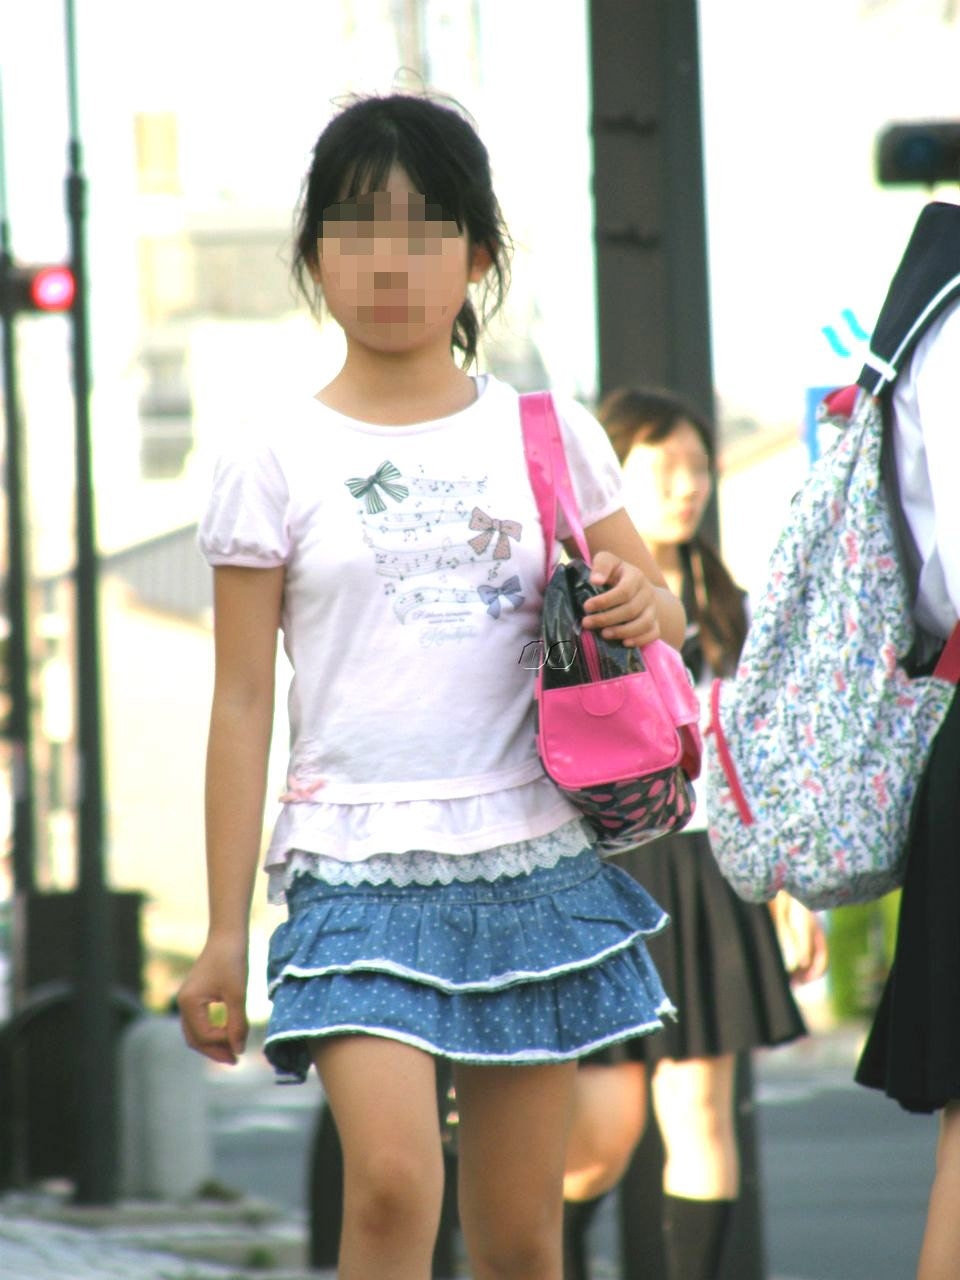 JS小学生おっぱい女子バスケ透け1985女児ヌード写真集投稿画像57枚